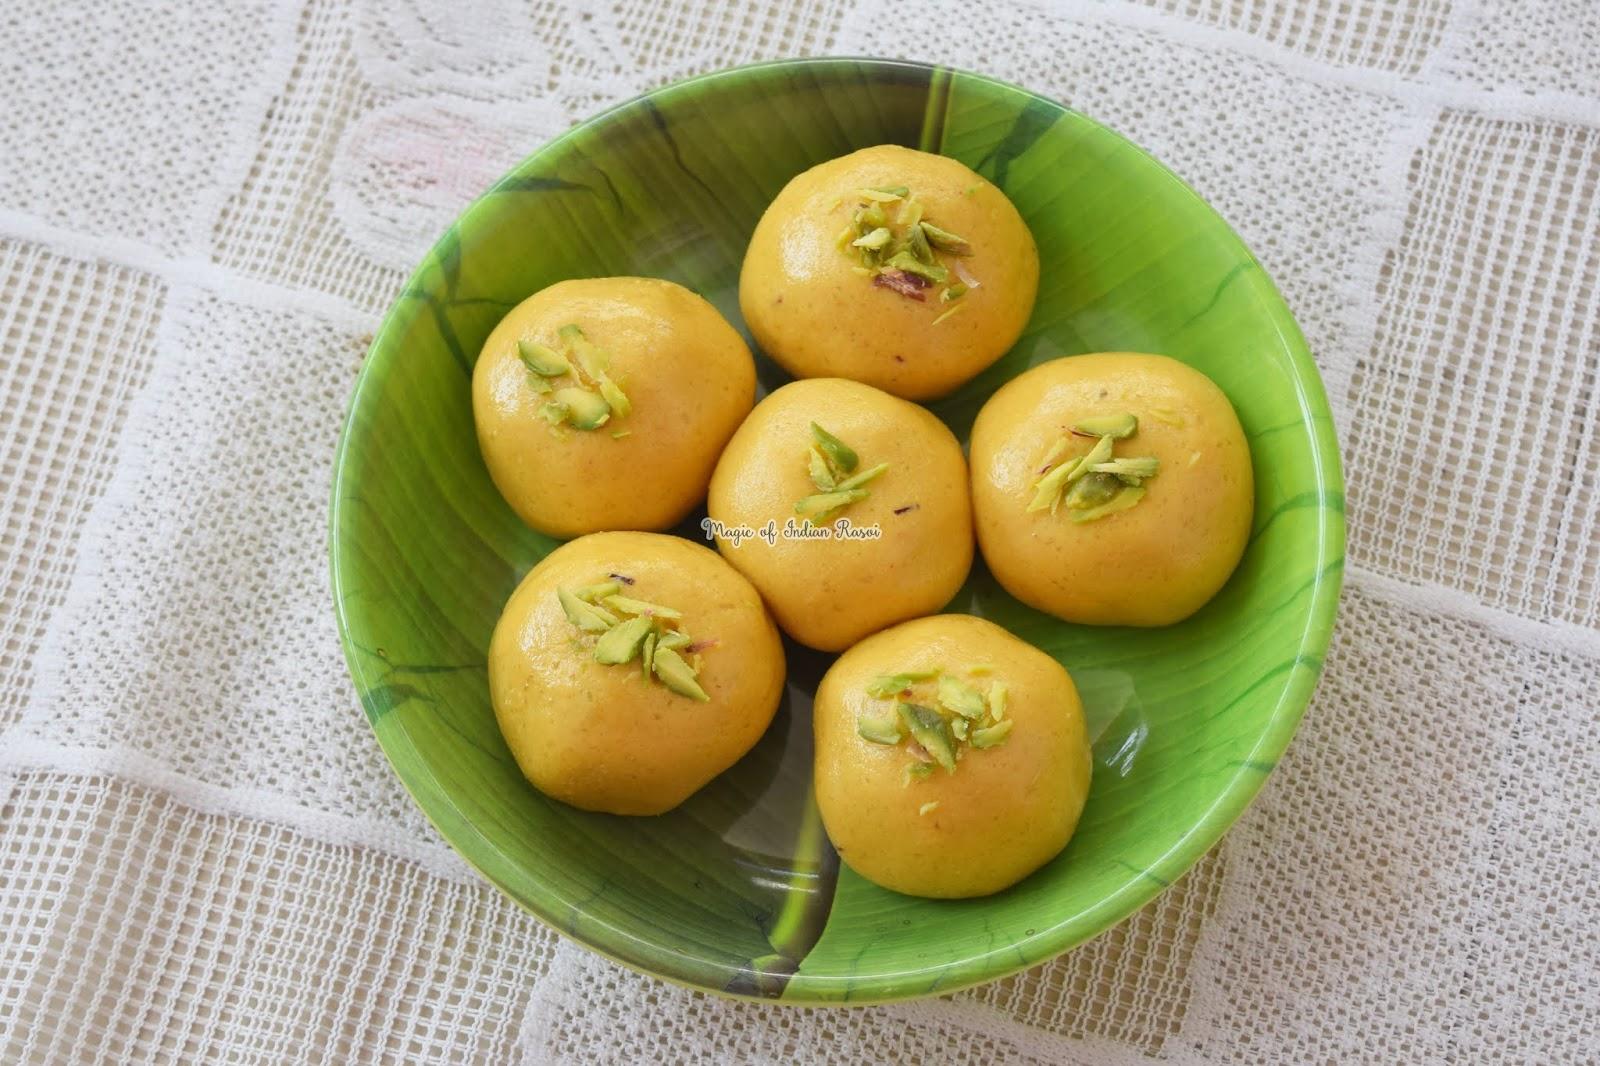 Perfect Besan Ladoo Recipe - हलवाई जैसे बेसन के लड्डू - Priya R - Magic of Indian Rasoi